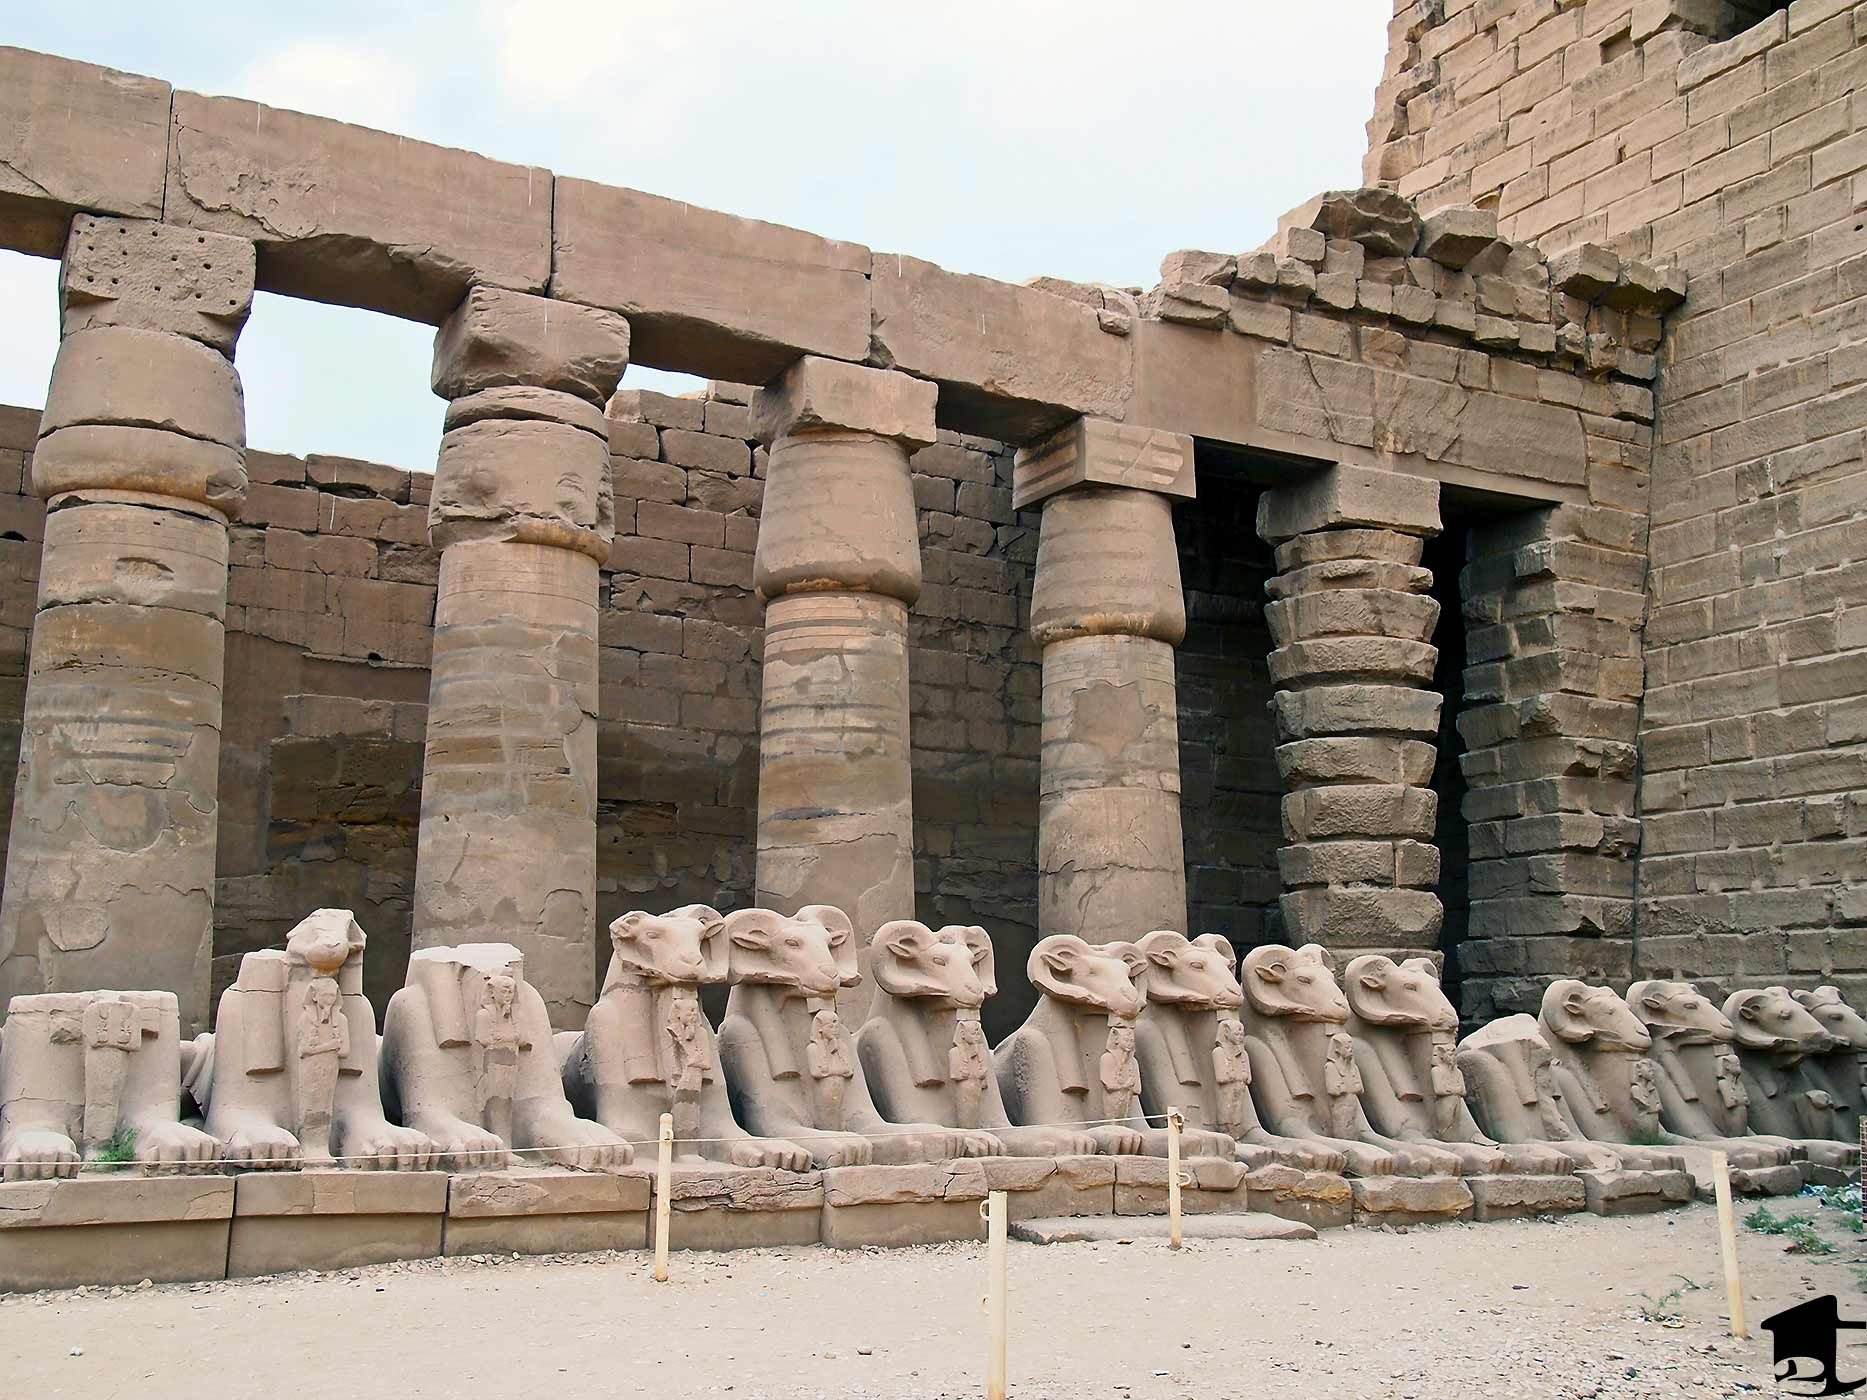 Pillars and statues at Karnak